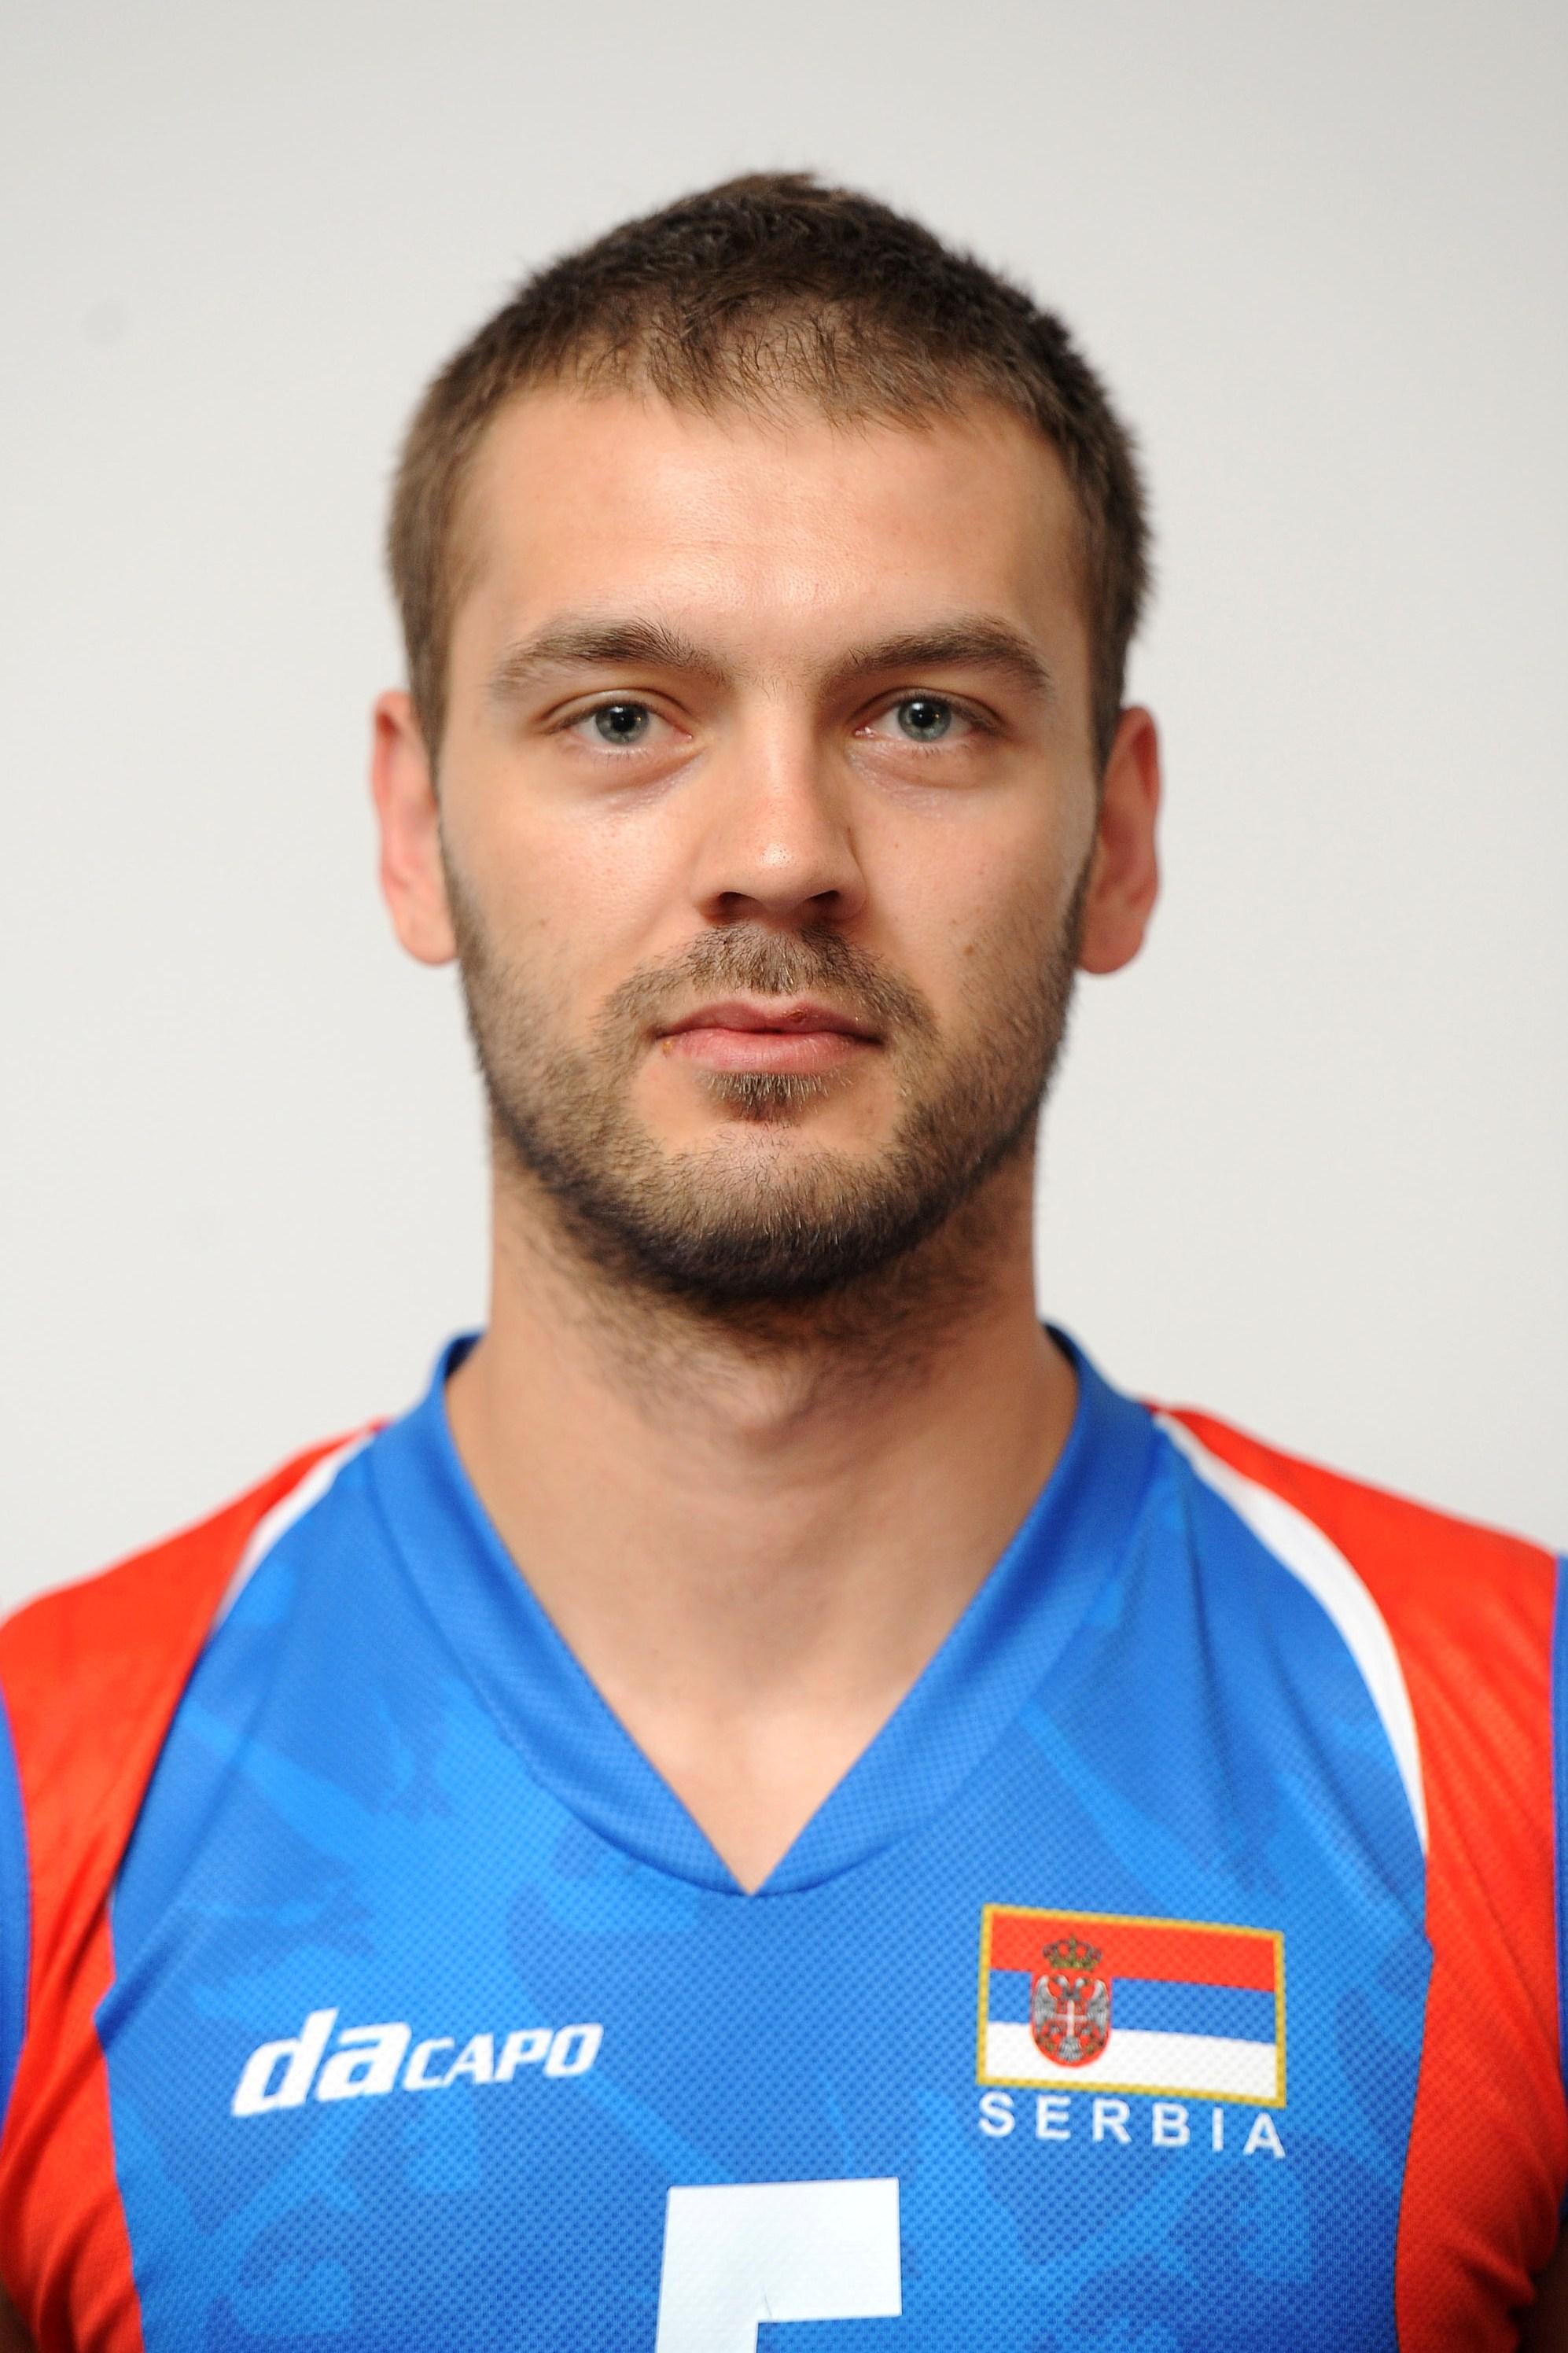 Vlado Petkovic